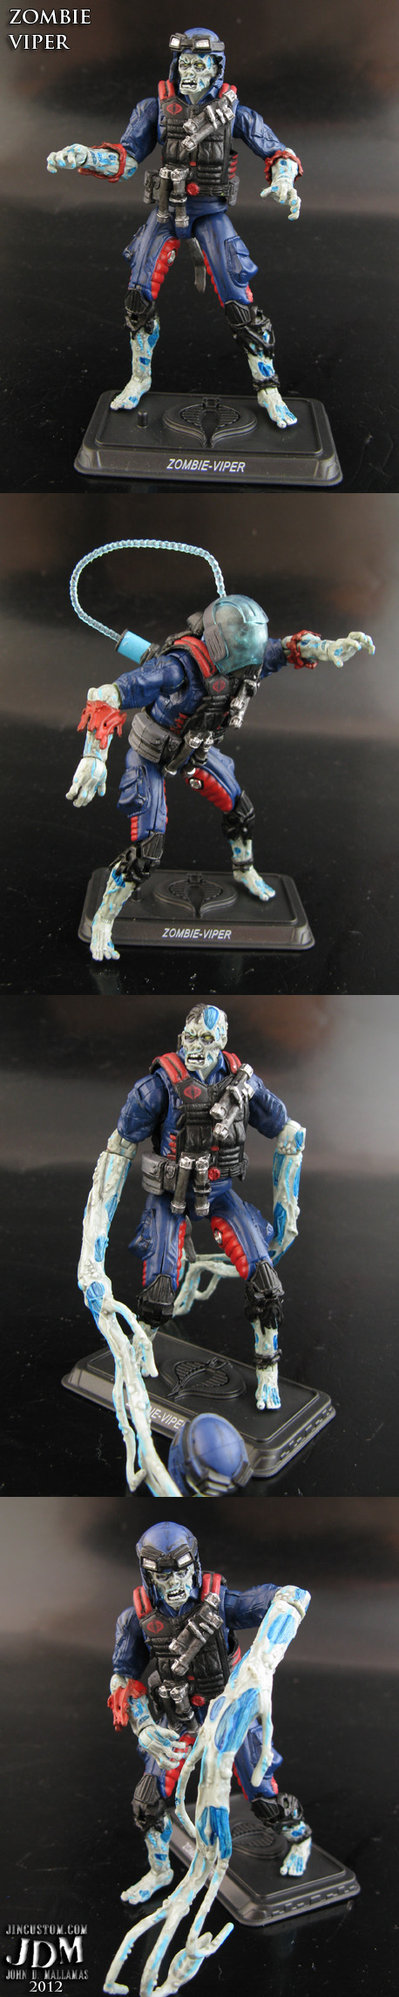 Cobra Zombie Viper custom action figure - G.I. Joe - John Mallamas